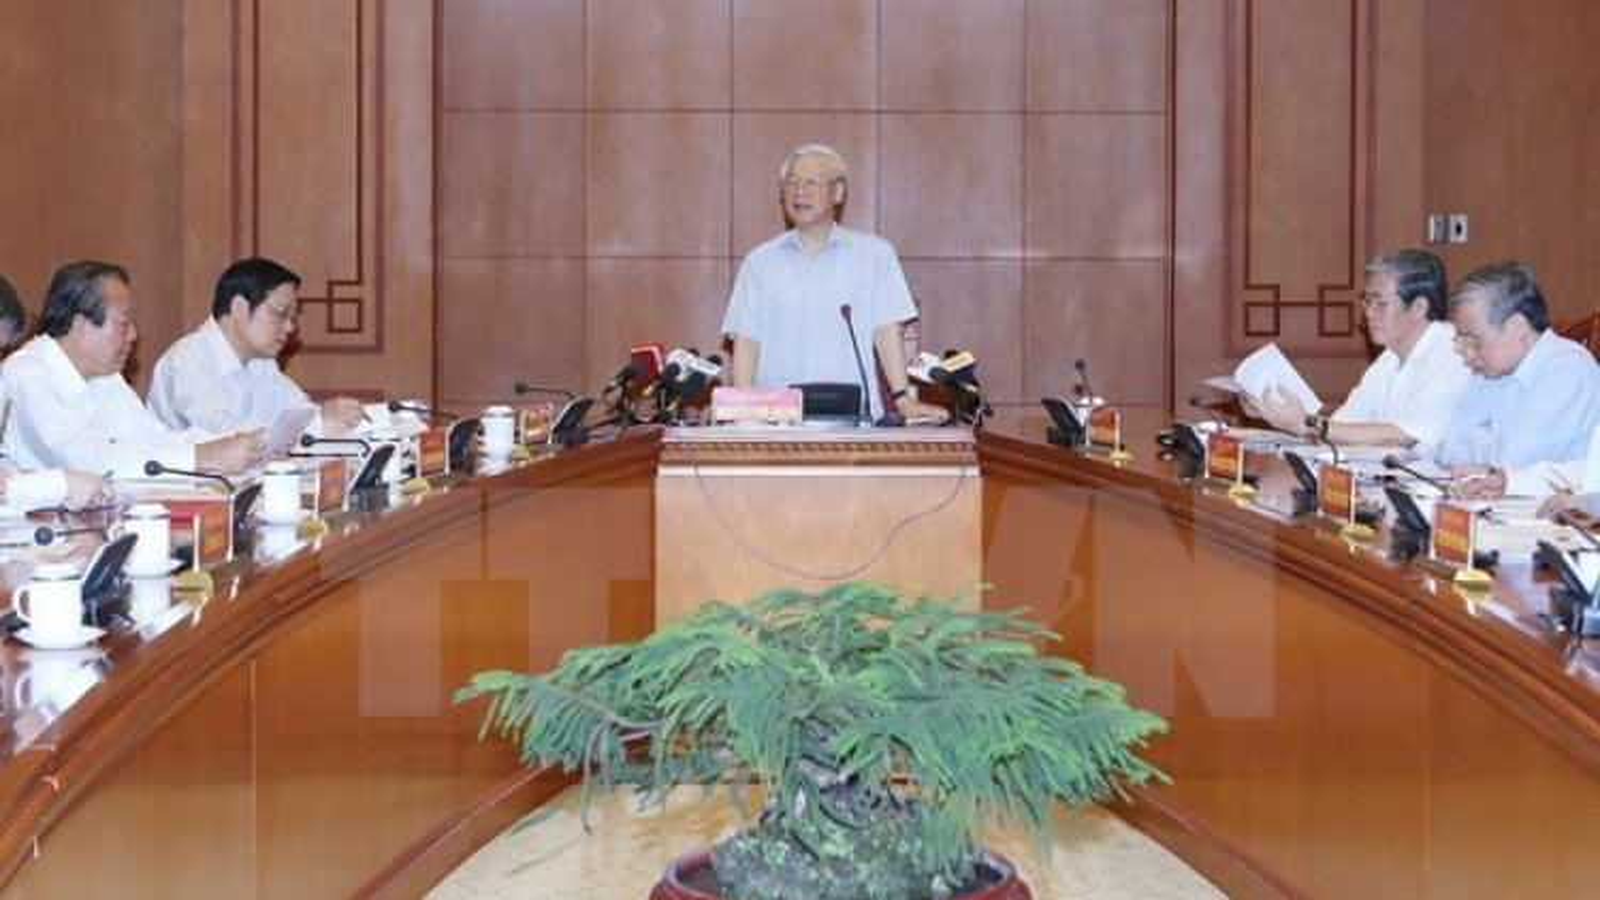 Meeting discusses anti-corruption work